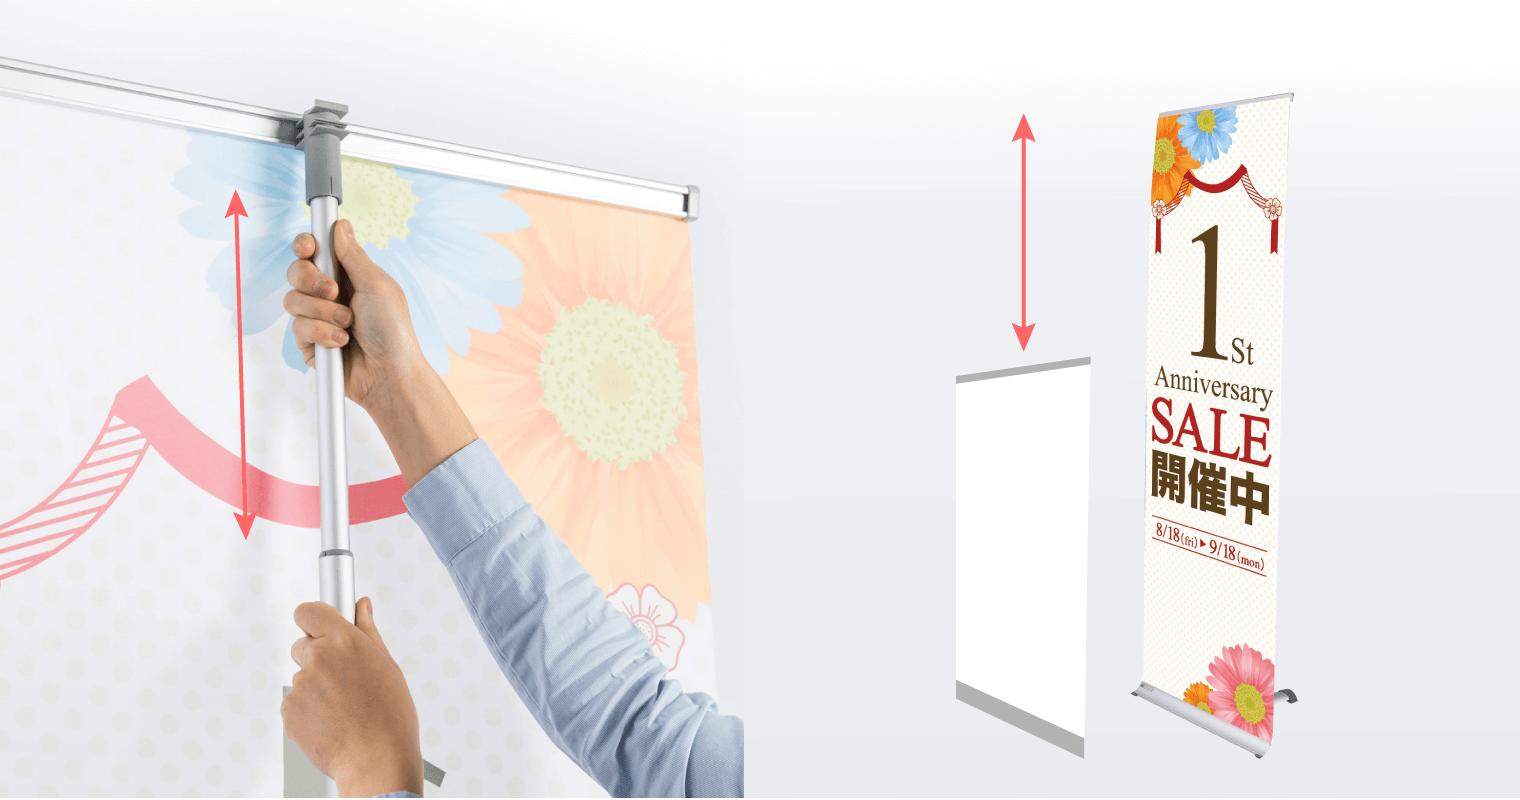 Iバナーライトは高さを1m以下〜2mに調整可能